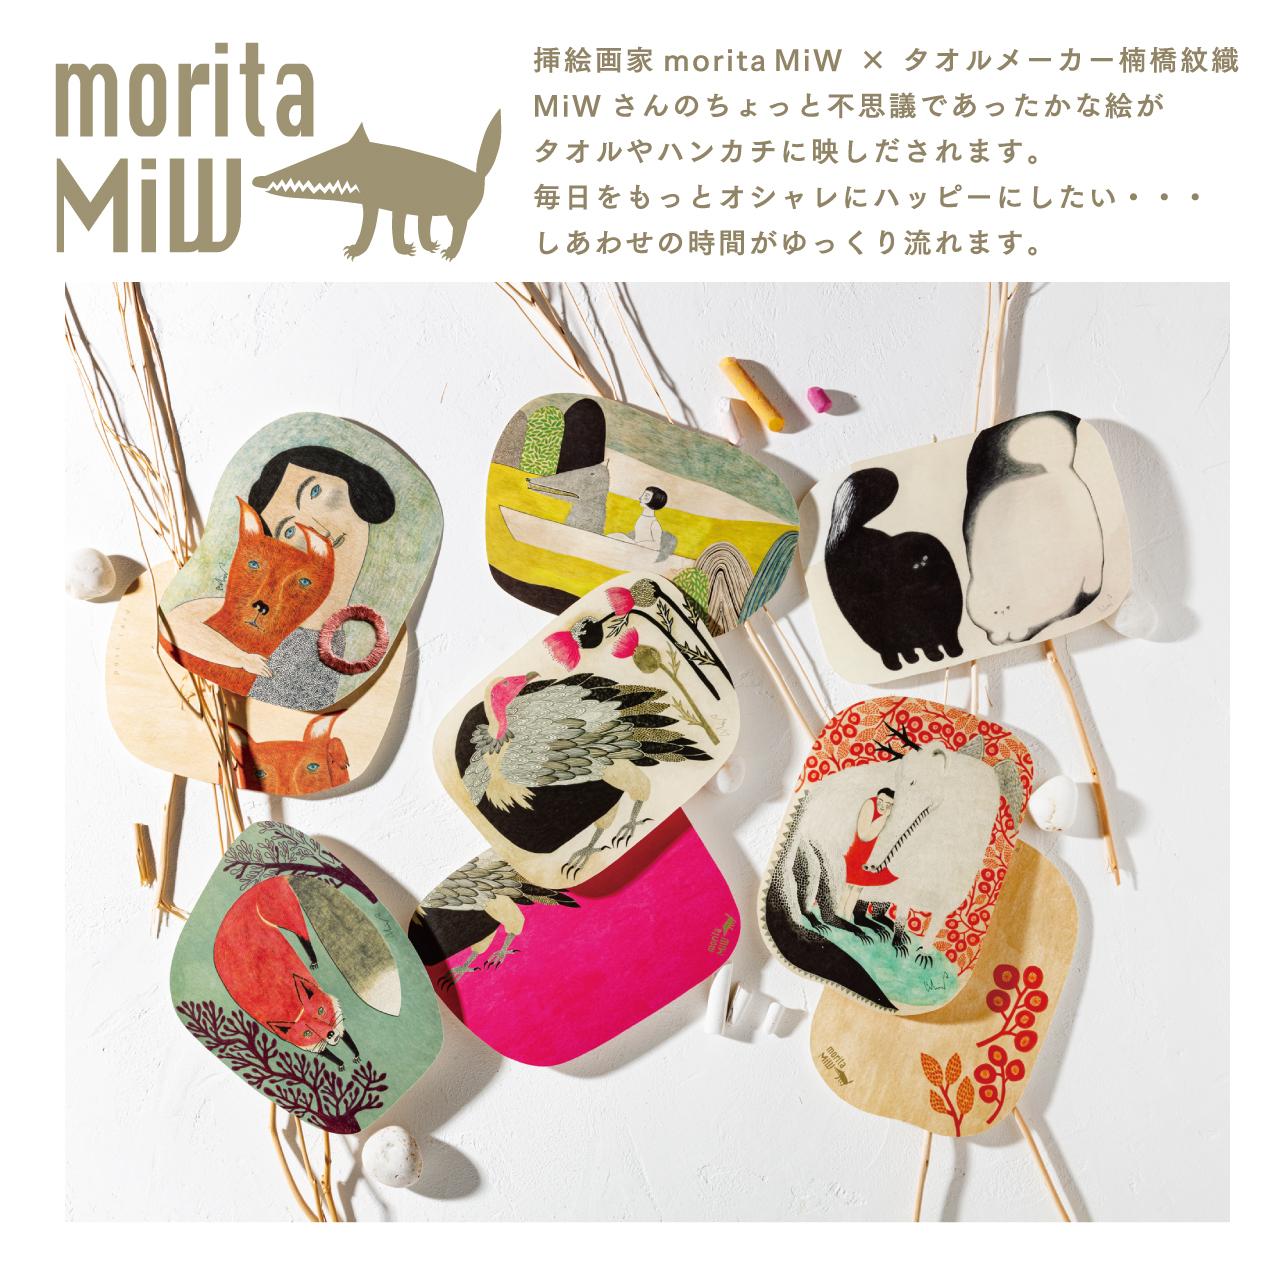 moritaMiW MiWポストカード 送料無料 激安 お買い得 セール価格 キ゛フト